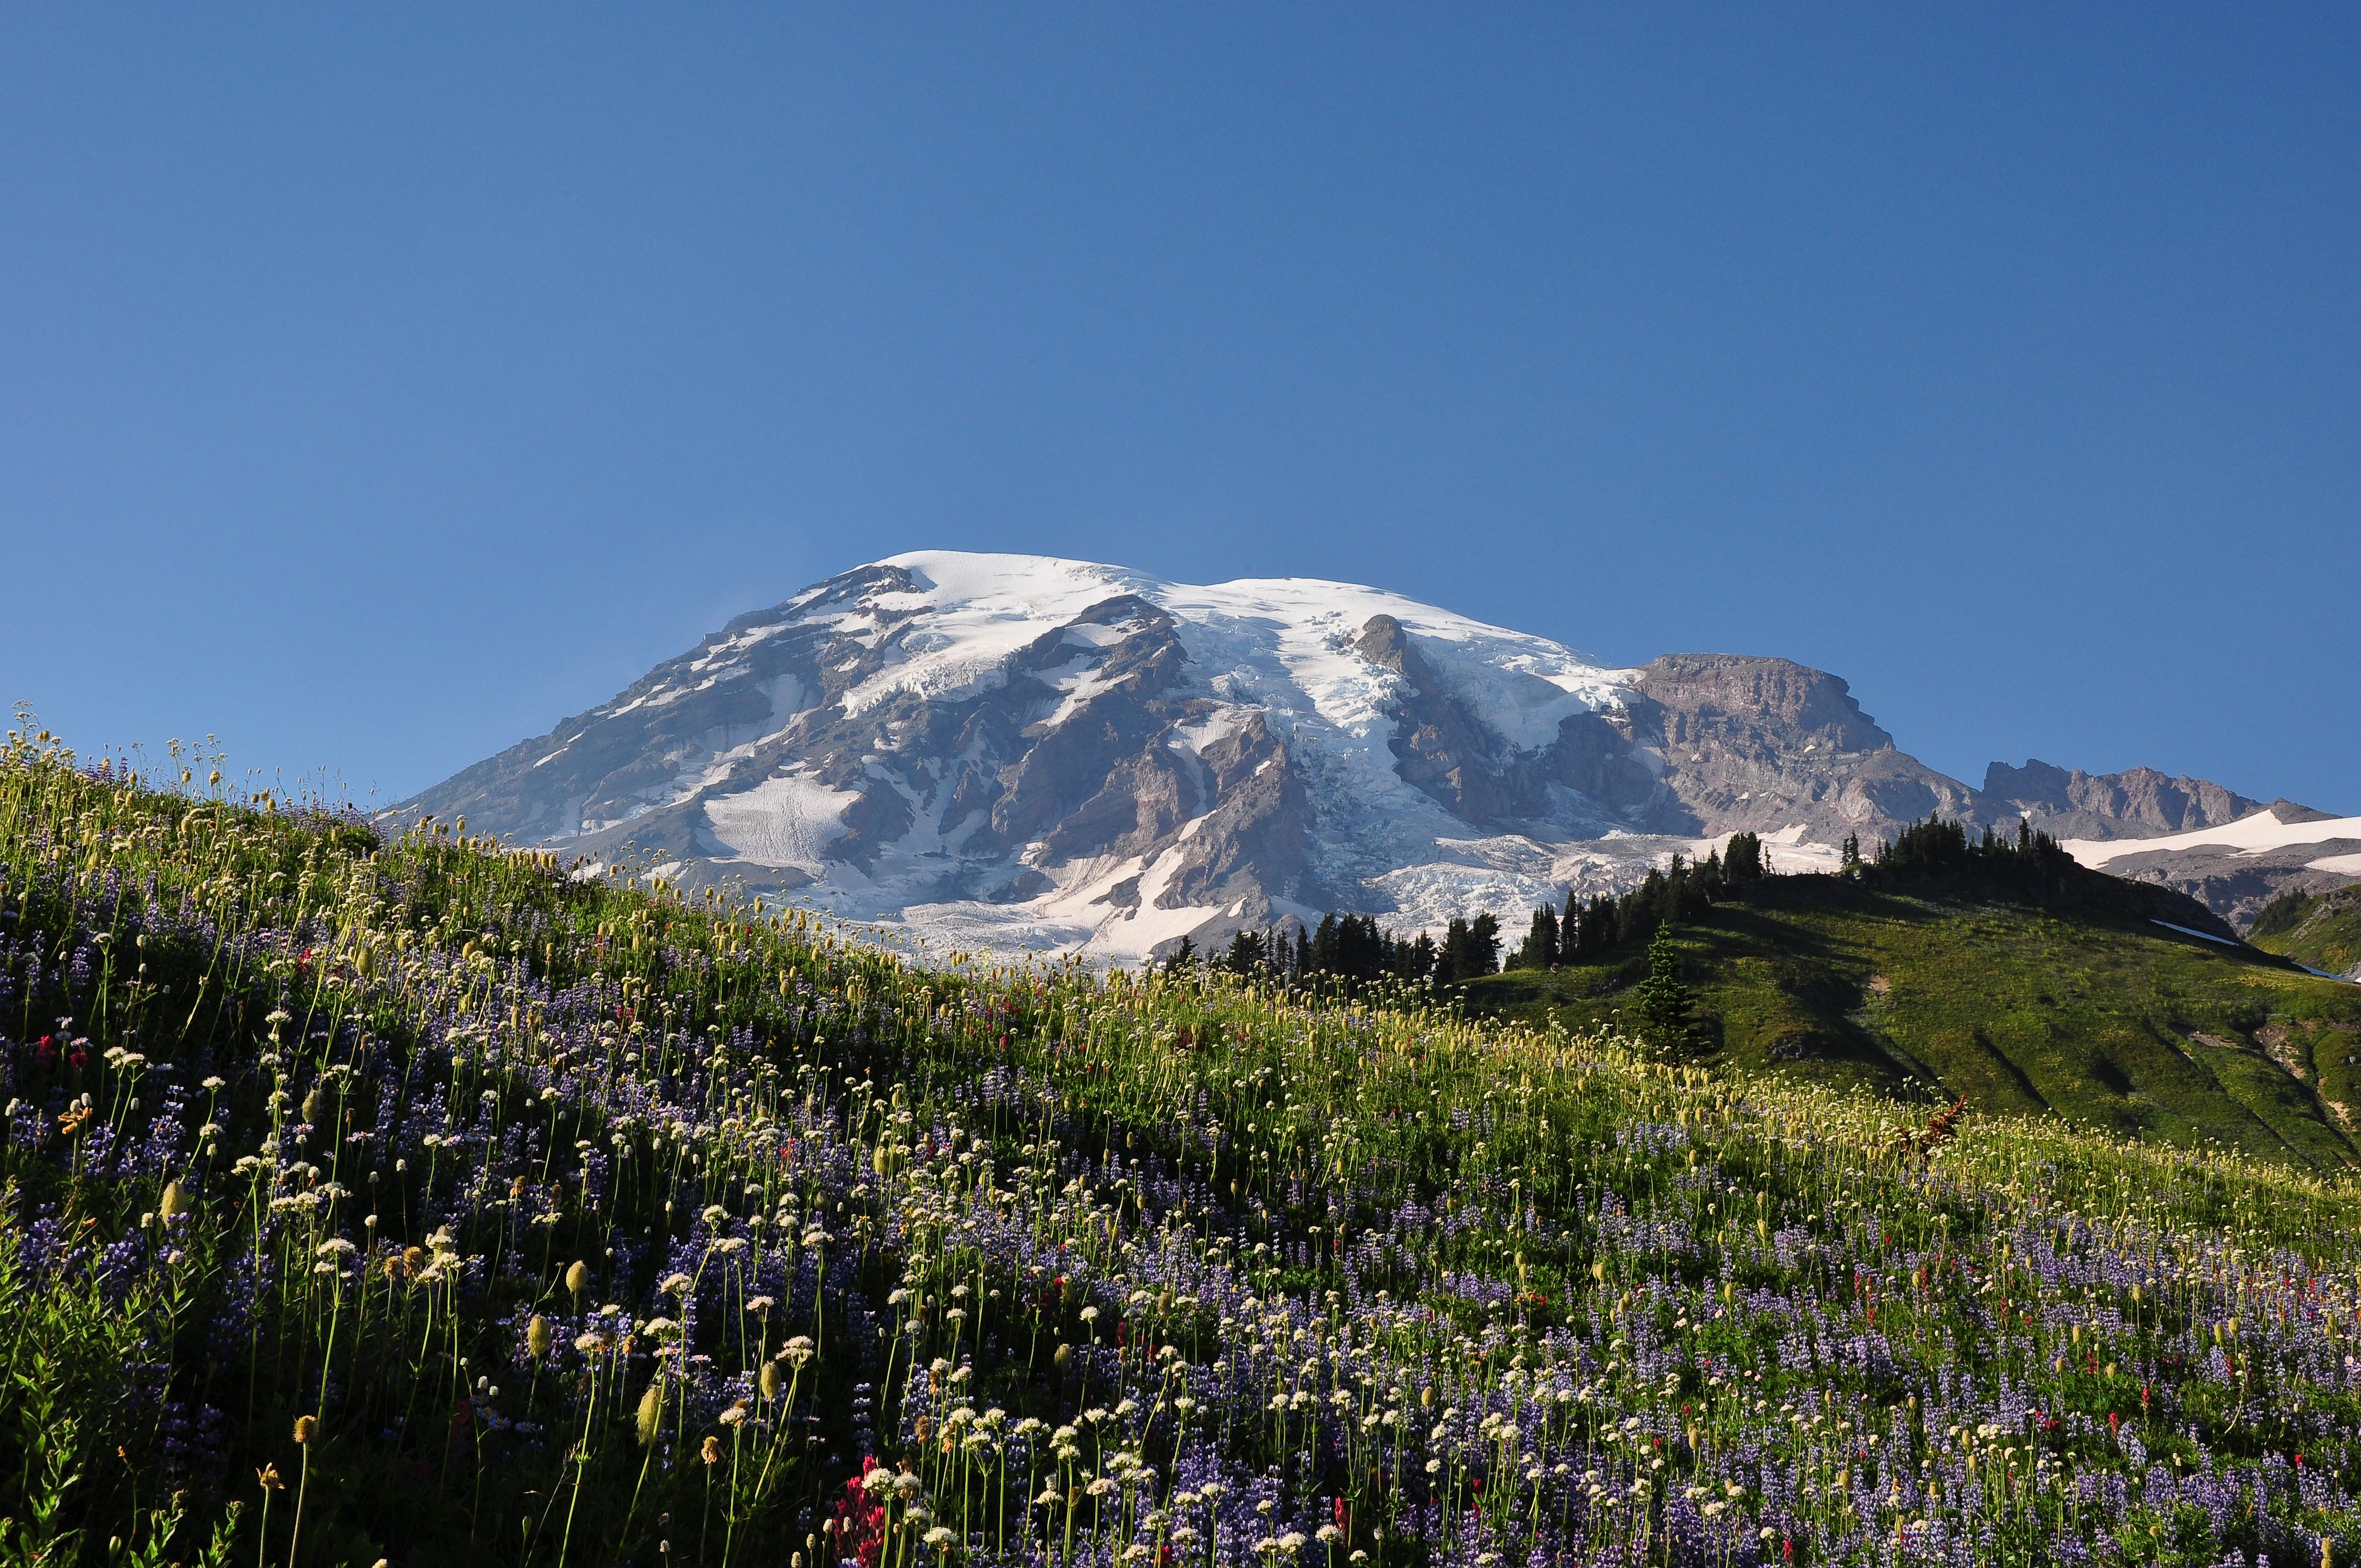 File:Mount Rainier (Washington state, USA).jpg - Wikimedia Commons